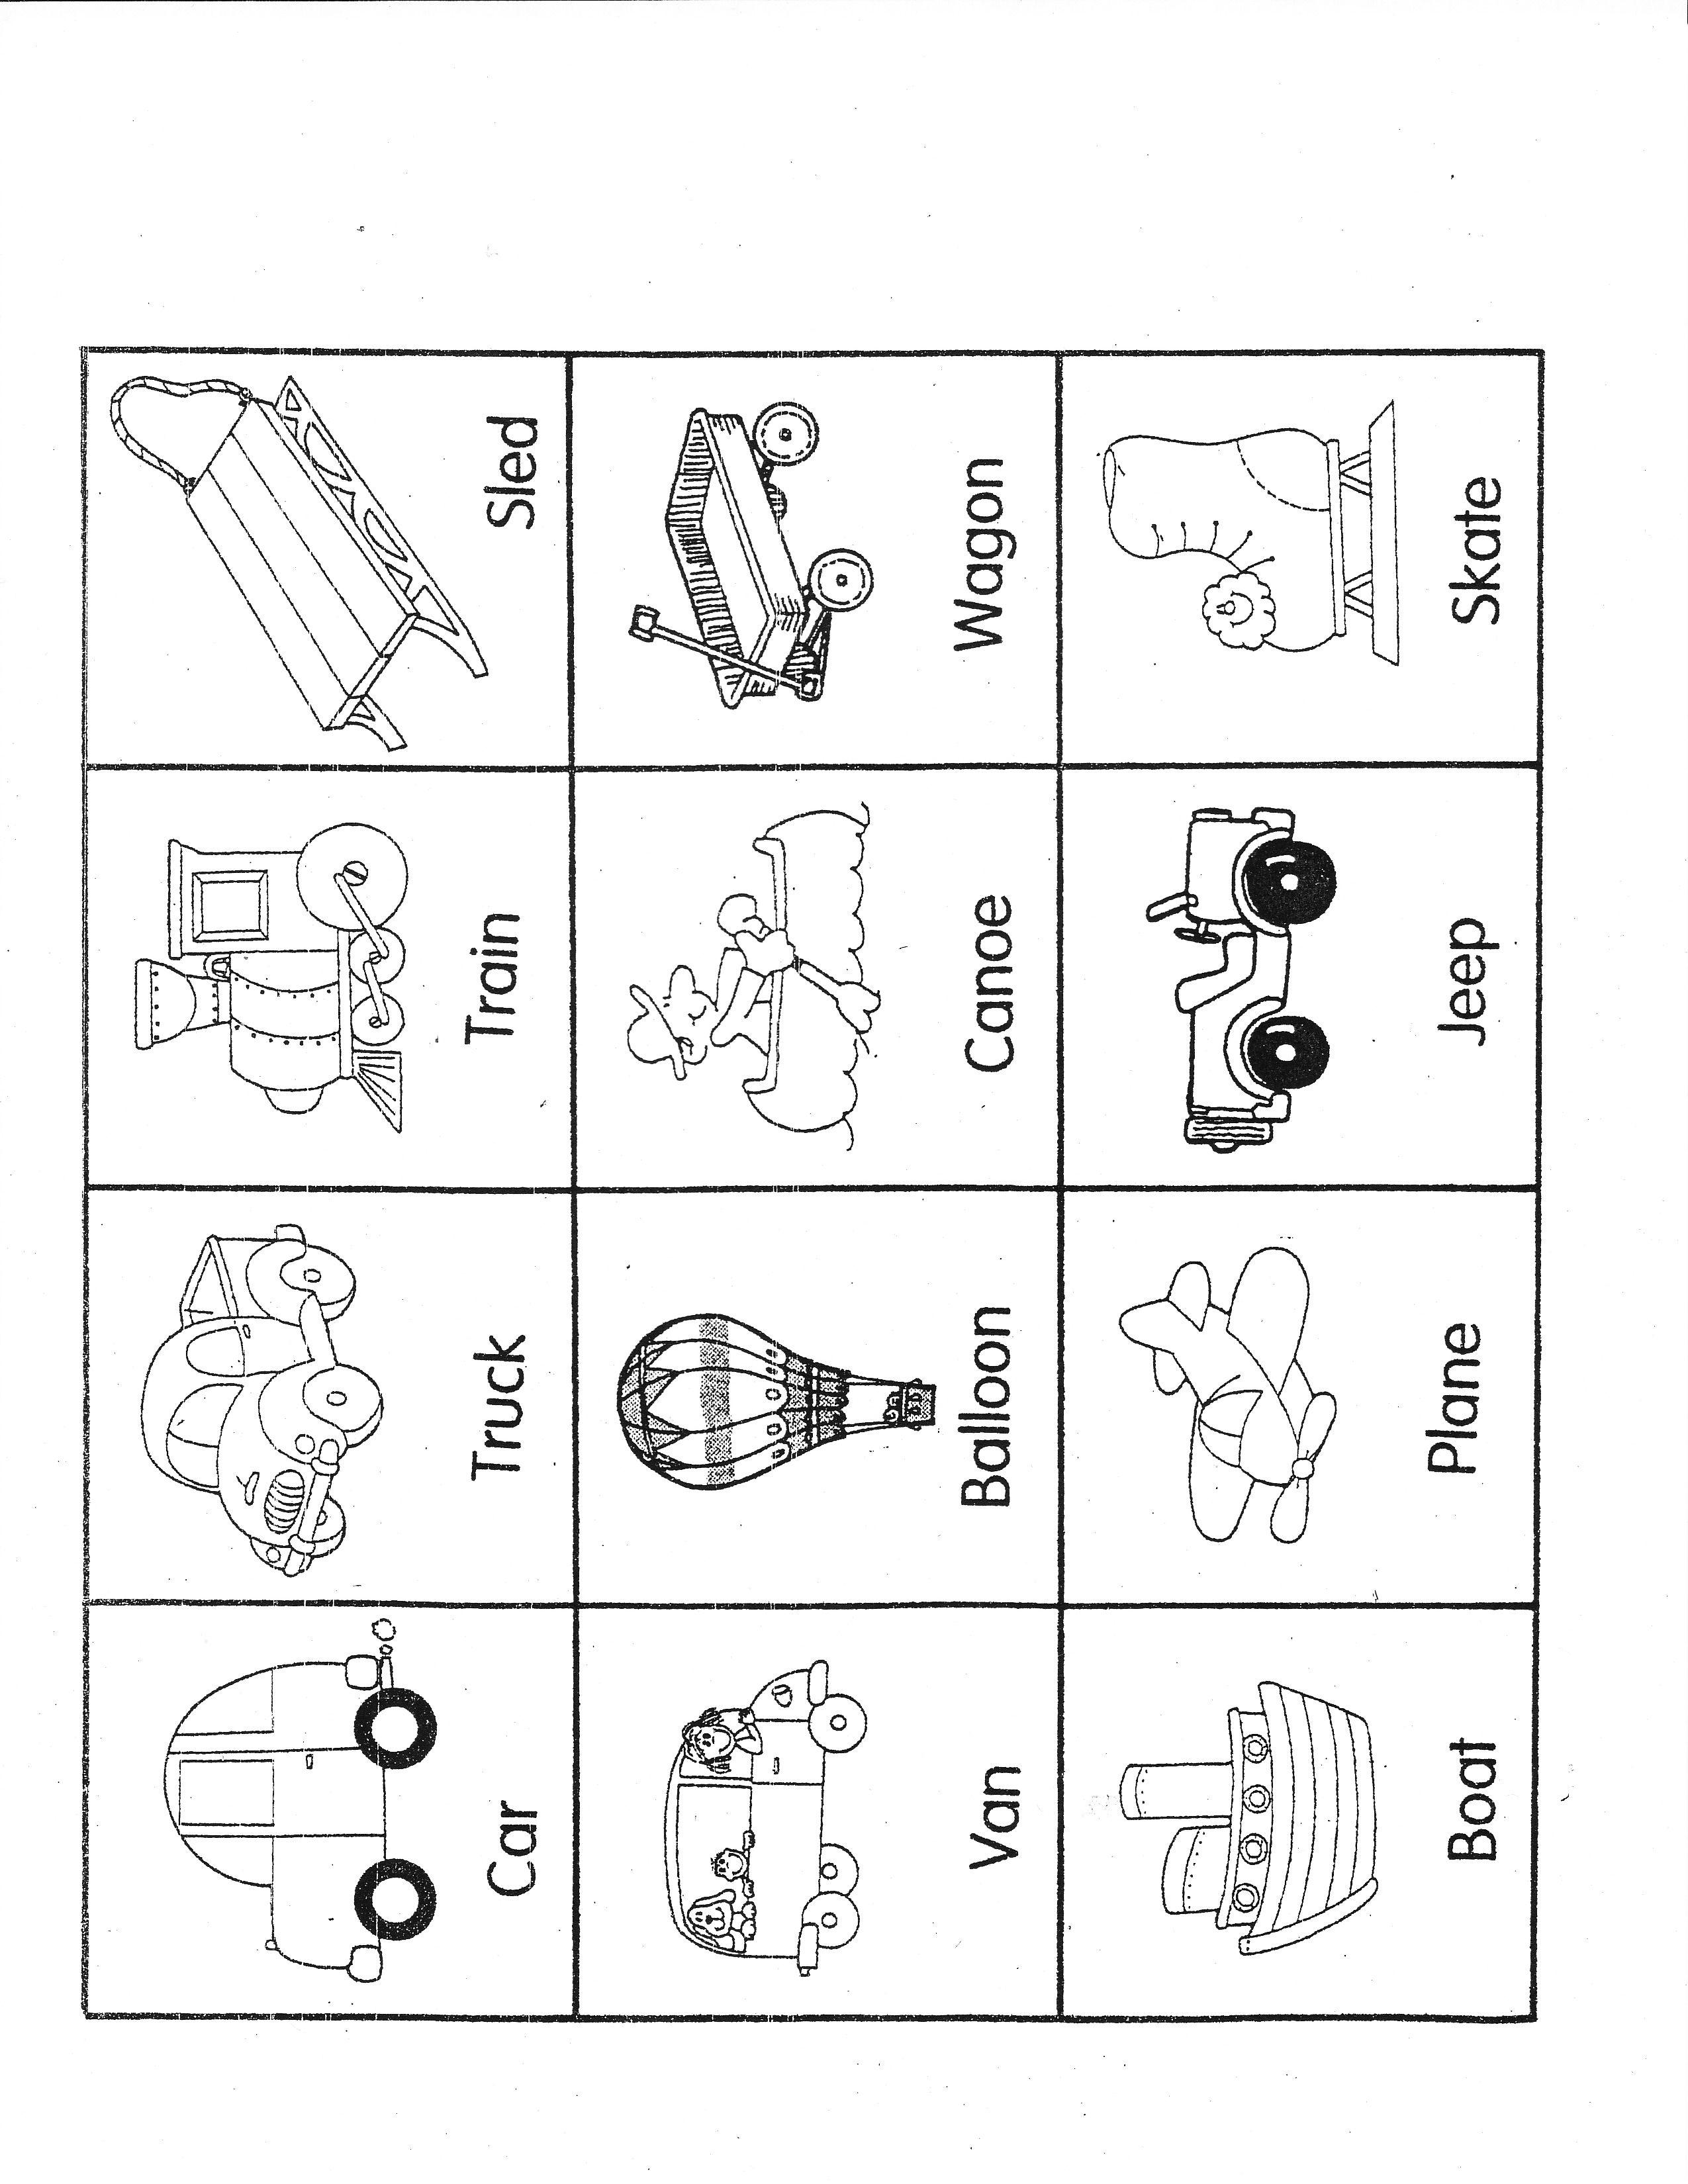 reinforce rhyming with transportation theme pre k activities transportation theme preschool. Black Bedroom Furniture Sets. Home Design Ideas